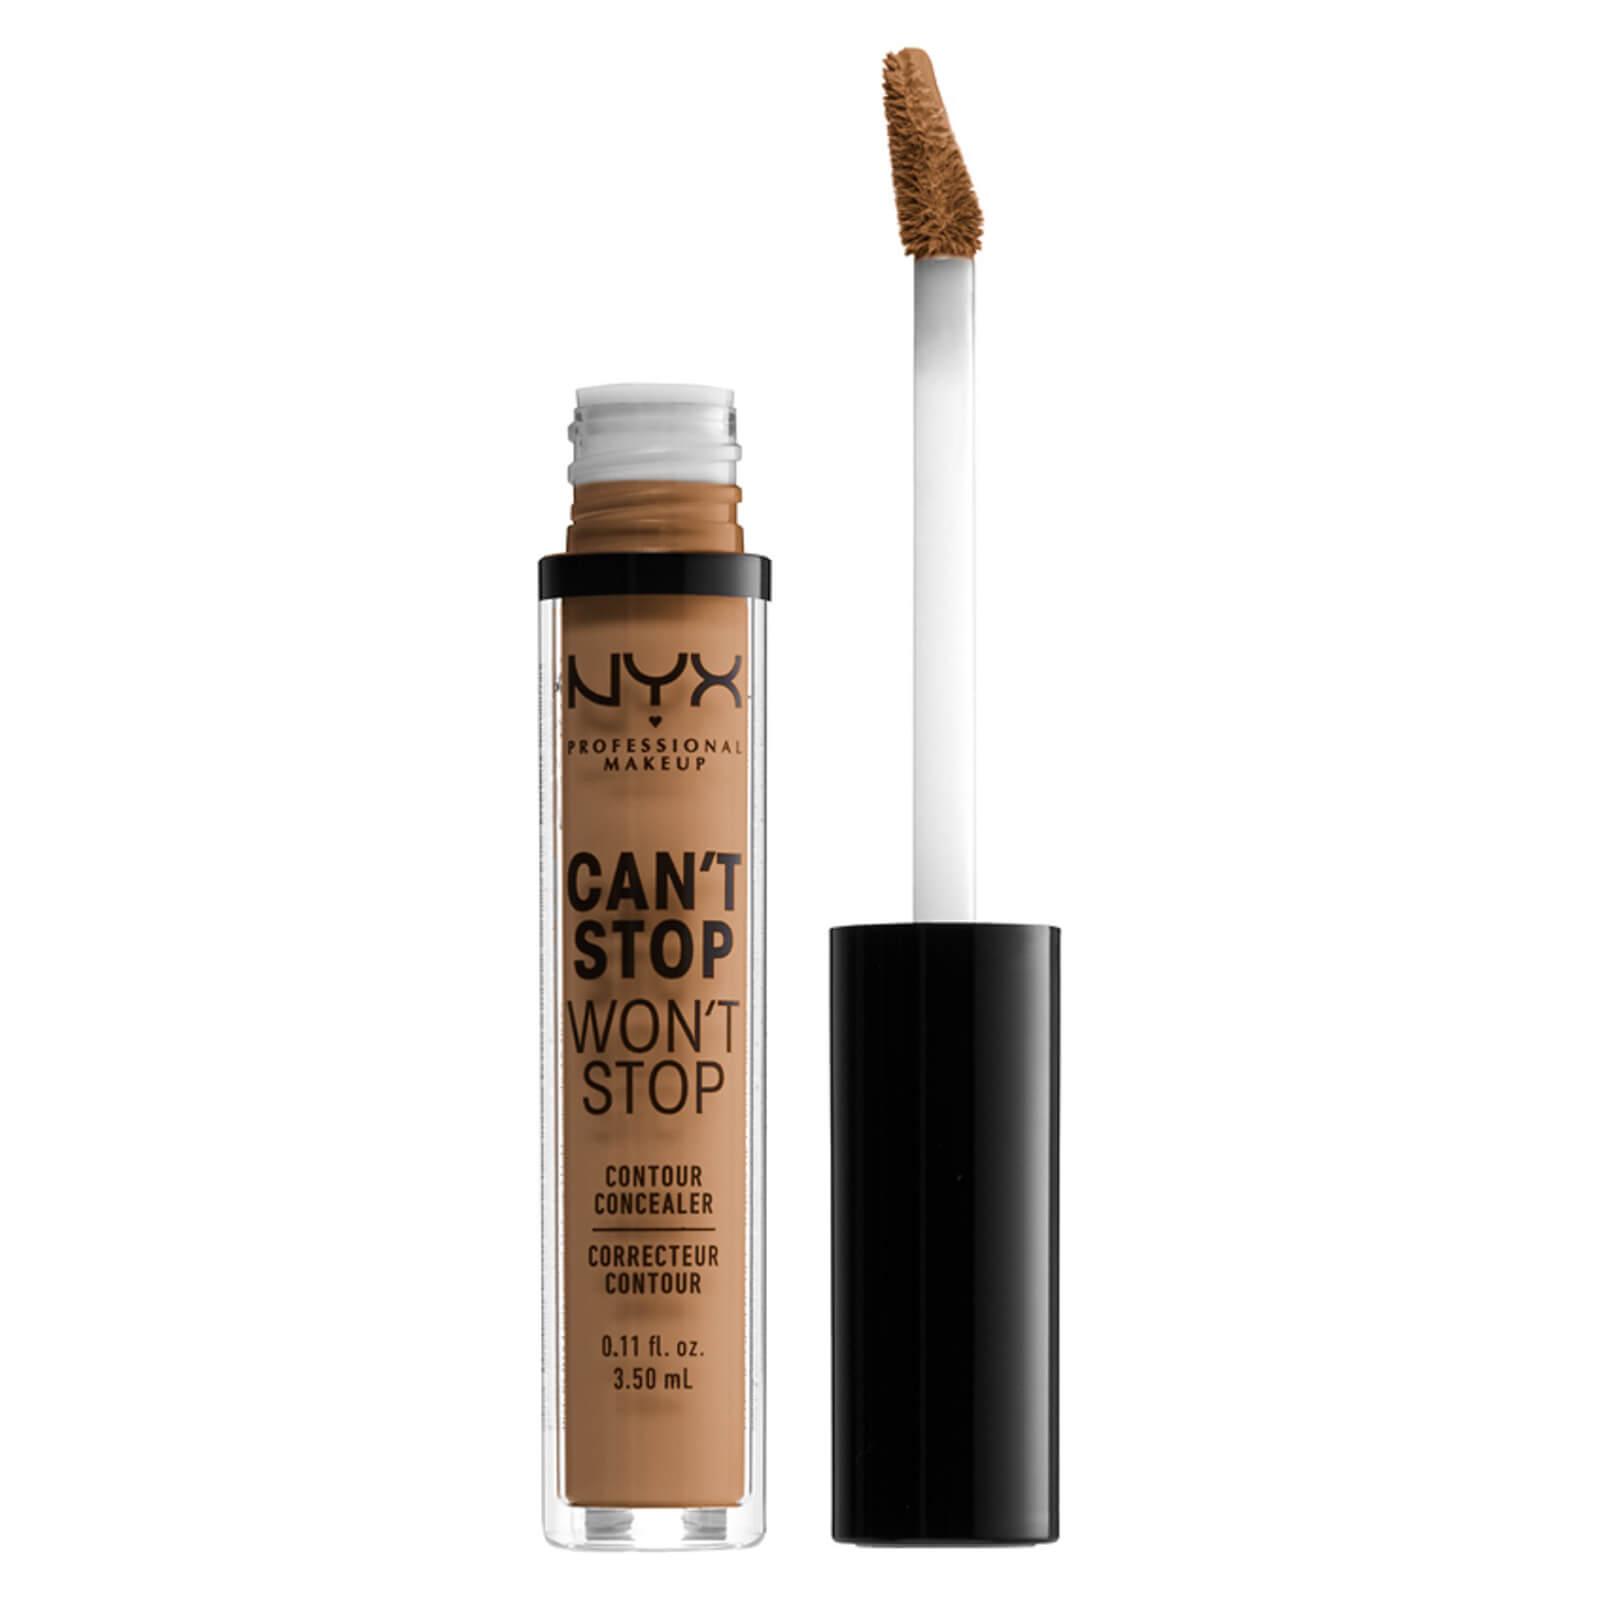 NYX Professional Makeup Can't Stop Won't Stop Contour Concealer (Various Shades) - Neutral Tan